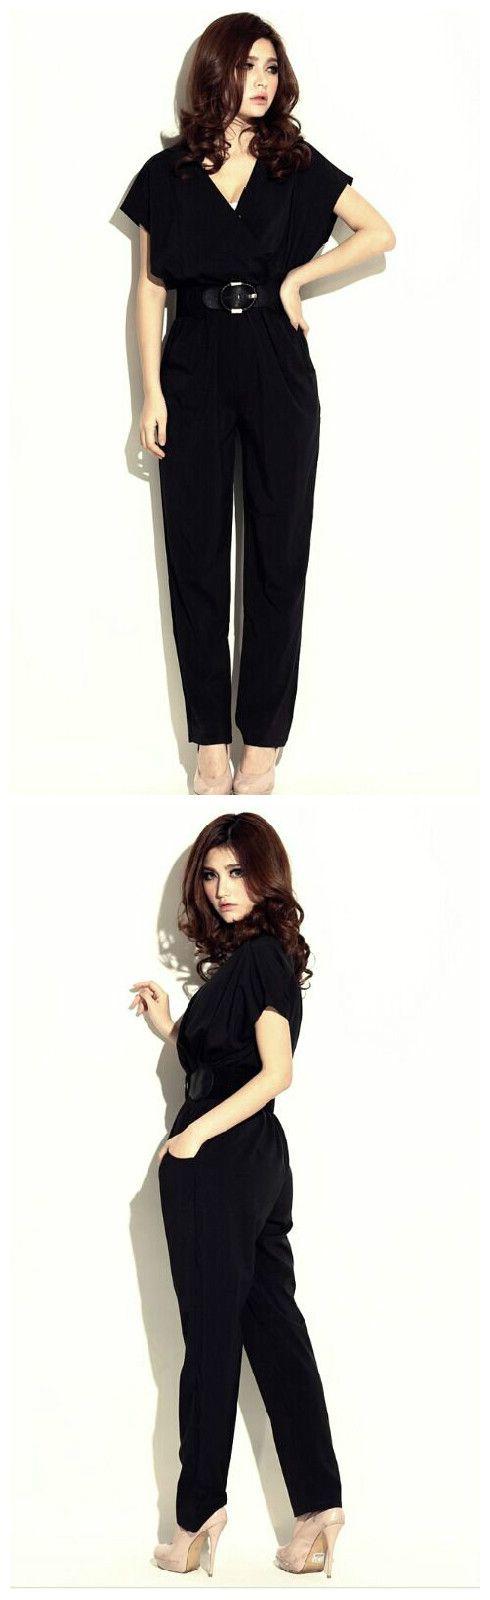 Korean Fall Fashion Women Short Sleeve V Neck Pockets Jumpsuits